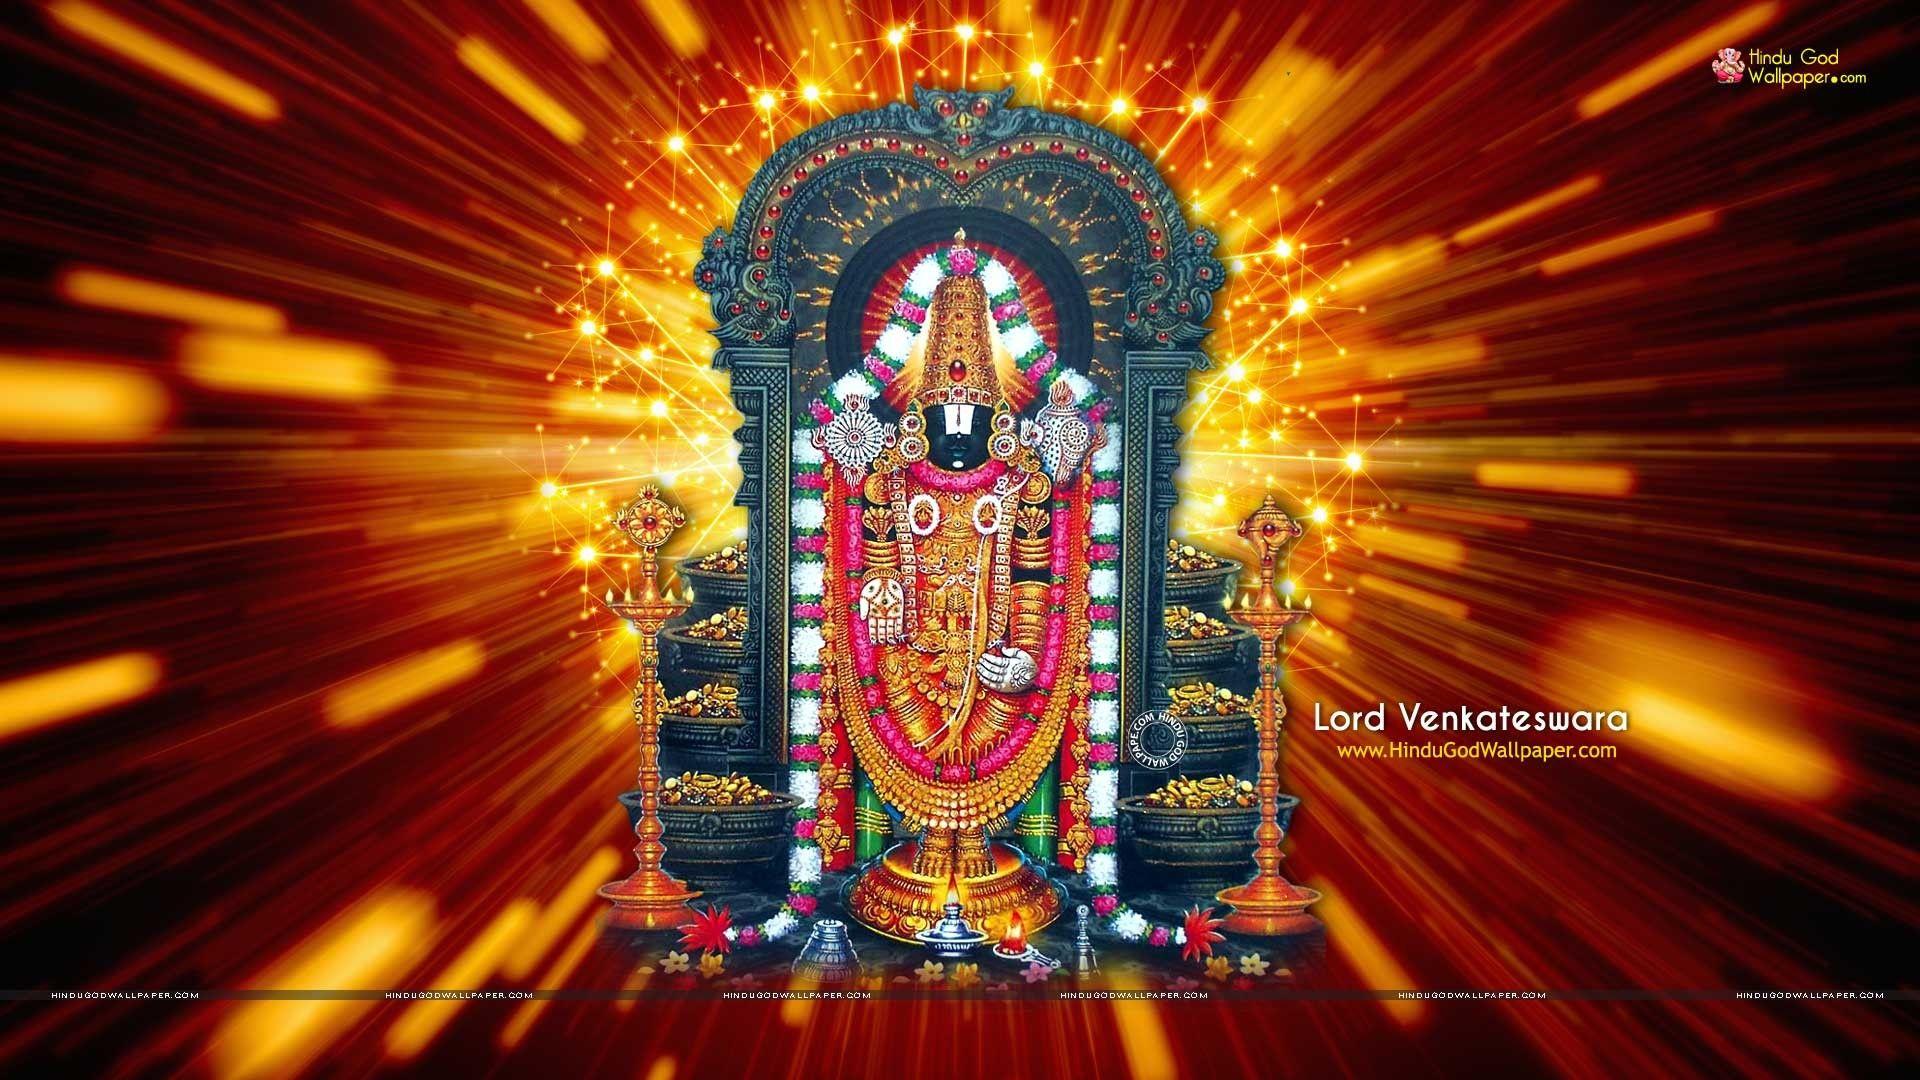 1920x1080 Lord Venkateswara Hd Wallpapers 1080p Hd Wallpapers 1080p Hd Wallpaper God Hd Wallpaper